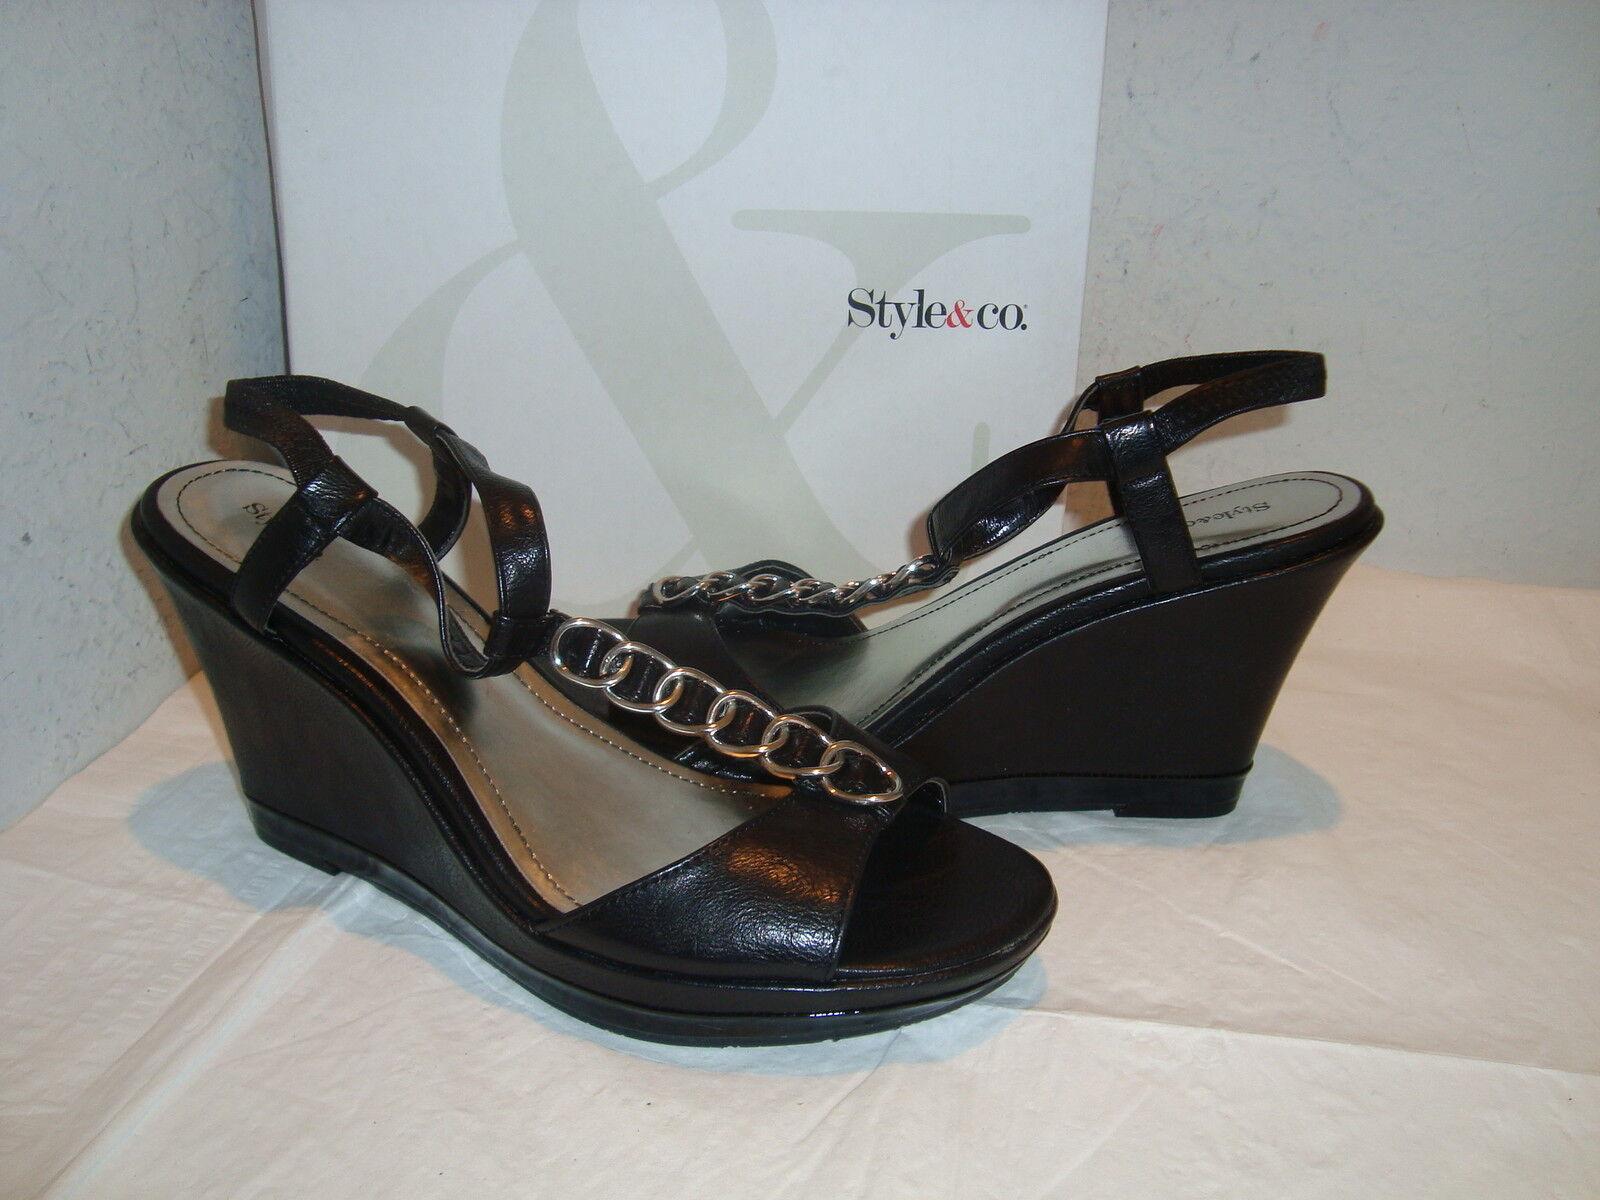 New Cuña Style & Co mujer Lew Negro Cuña New Sandalias Zapatos 9.5 medio e53563